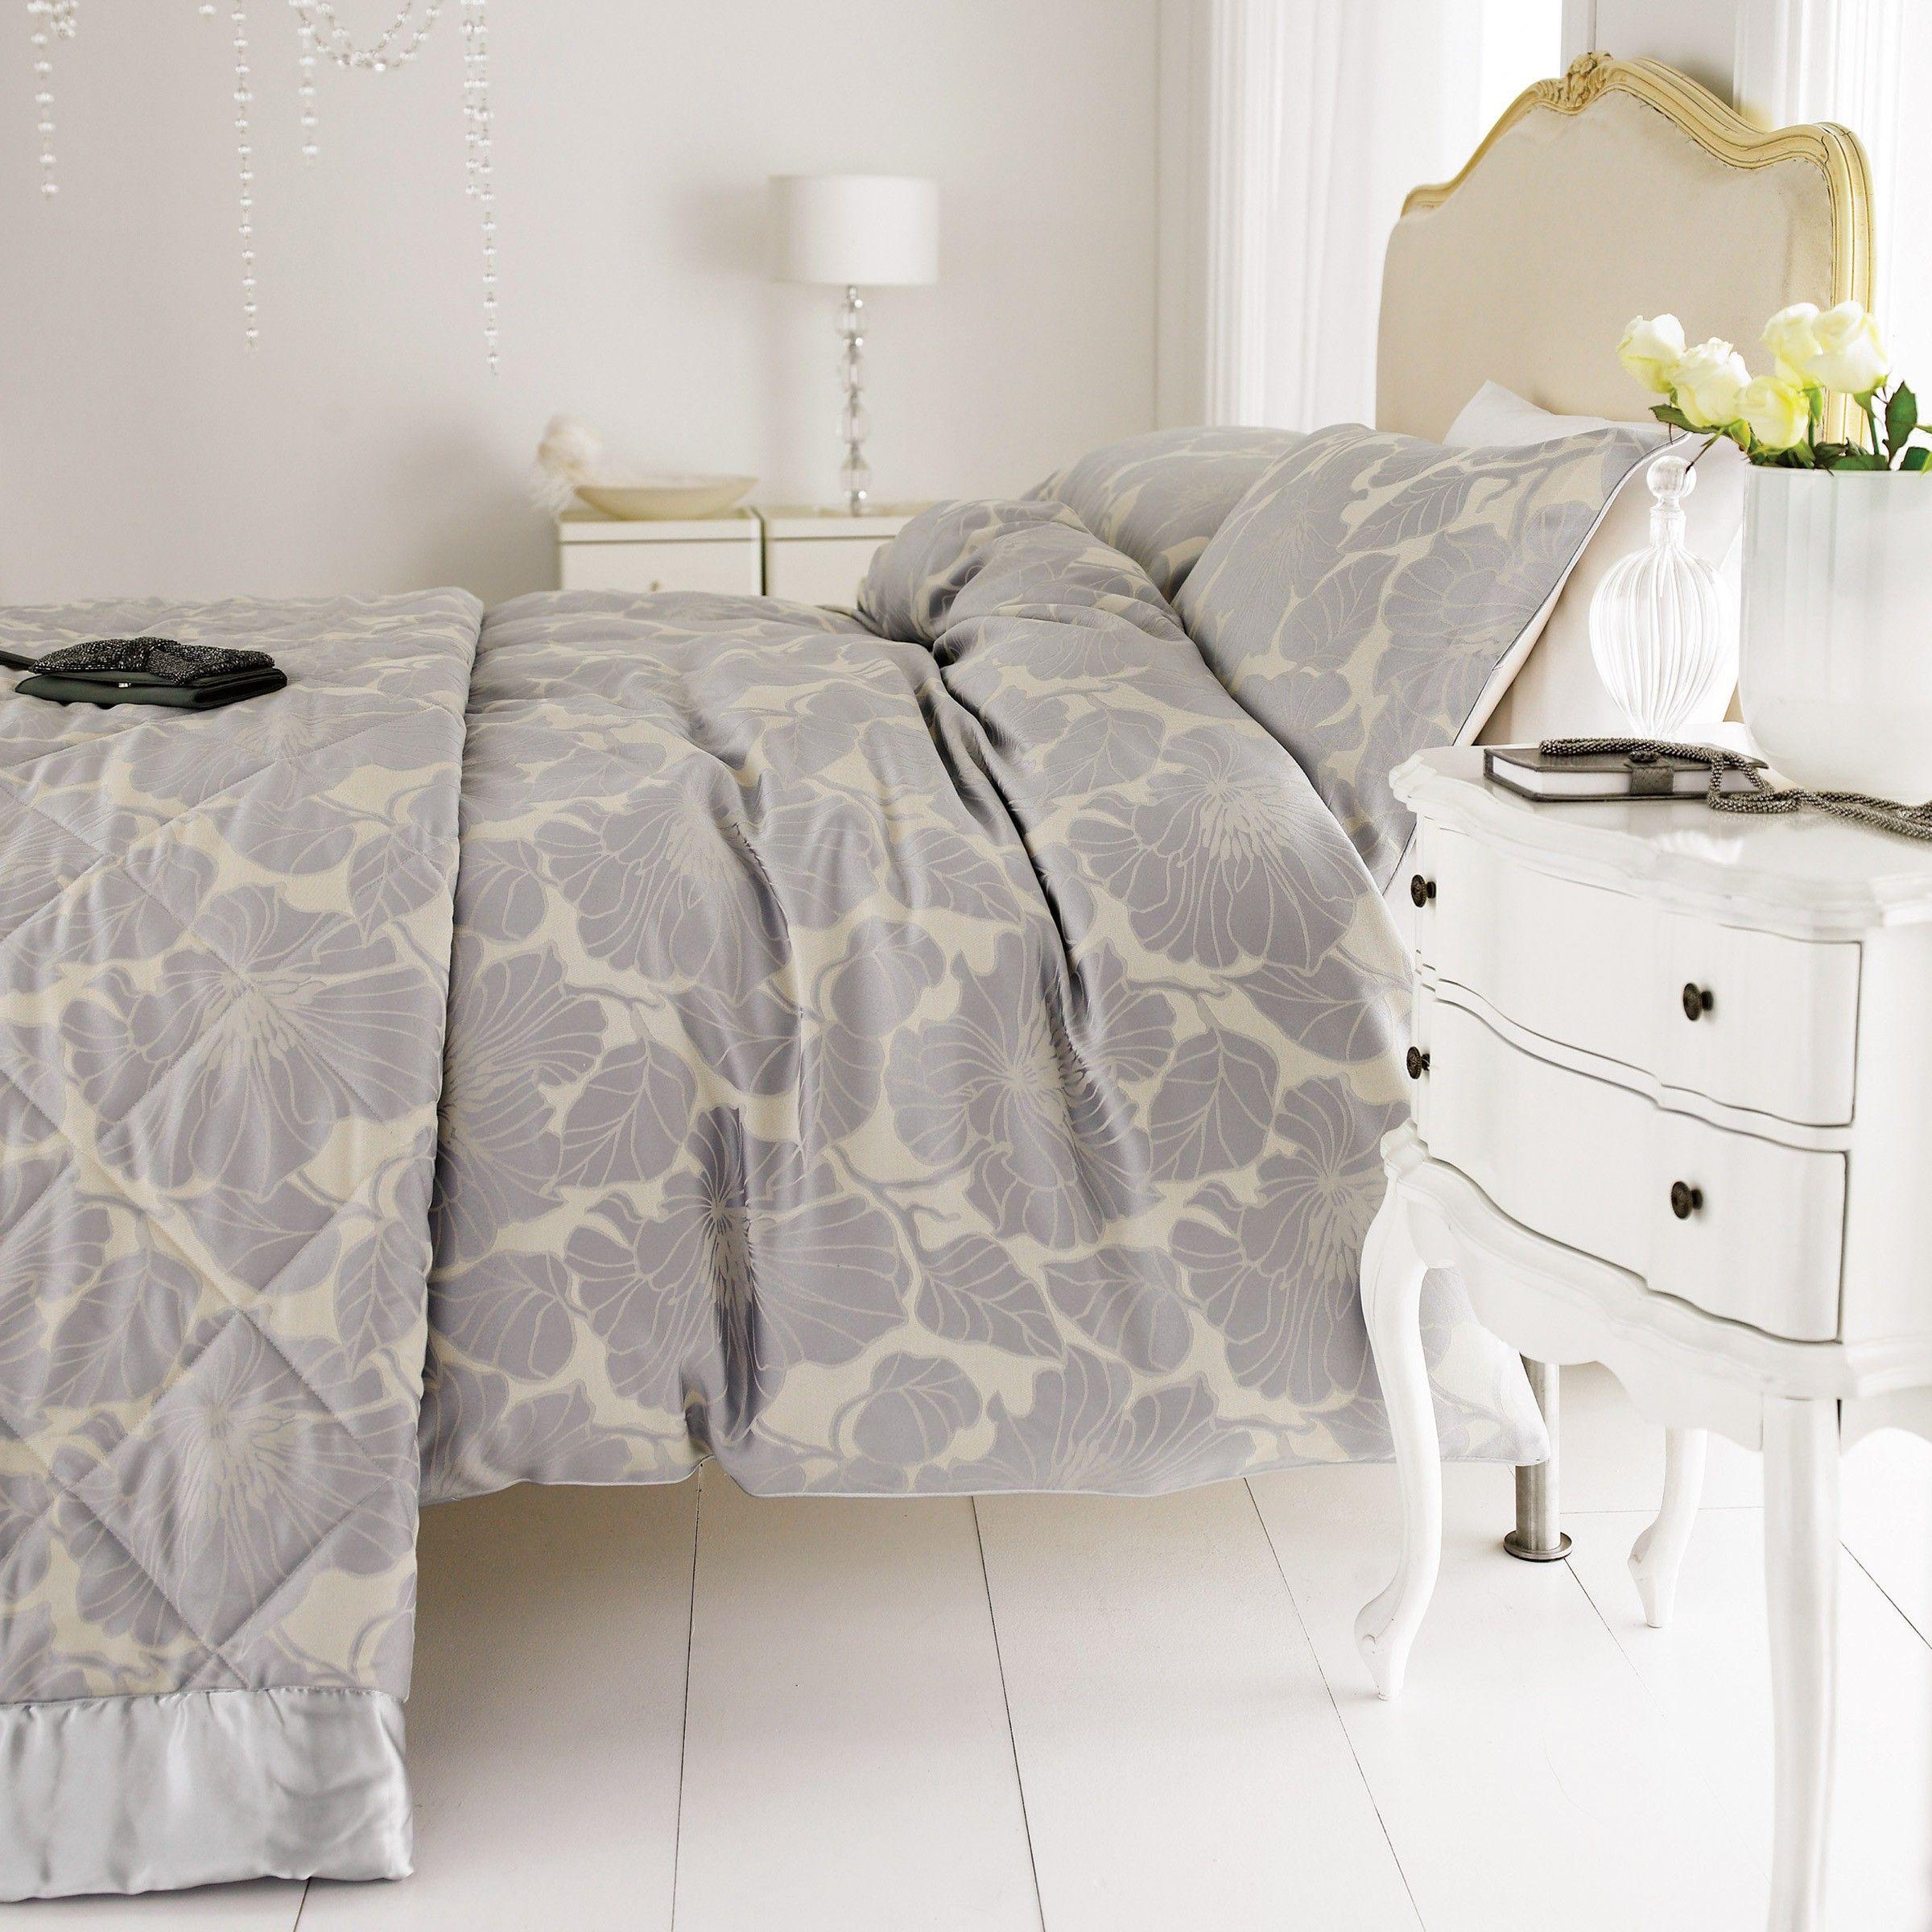 Jacquard Bed Sets Pion Silver By Harlequin Bedding At Bedeck 1951